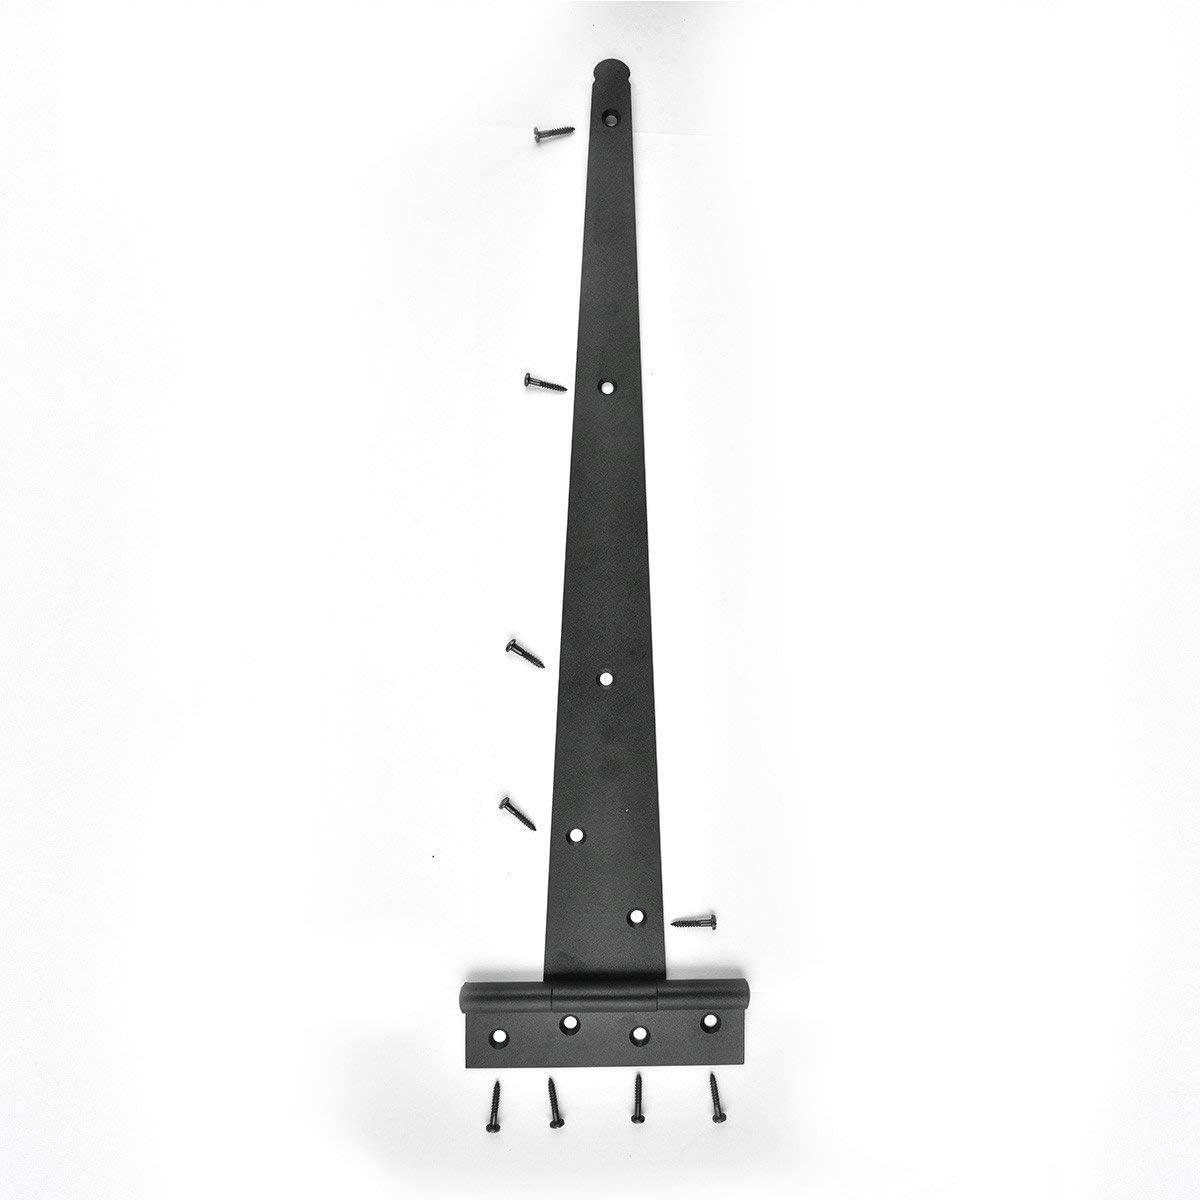 Rohi 4 X Tee Hinge Black Gate Door Shed Hinges Coated Heavy Duty 8 Black Wrought Hardware Iron Rustproof